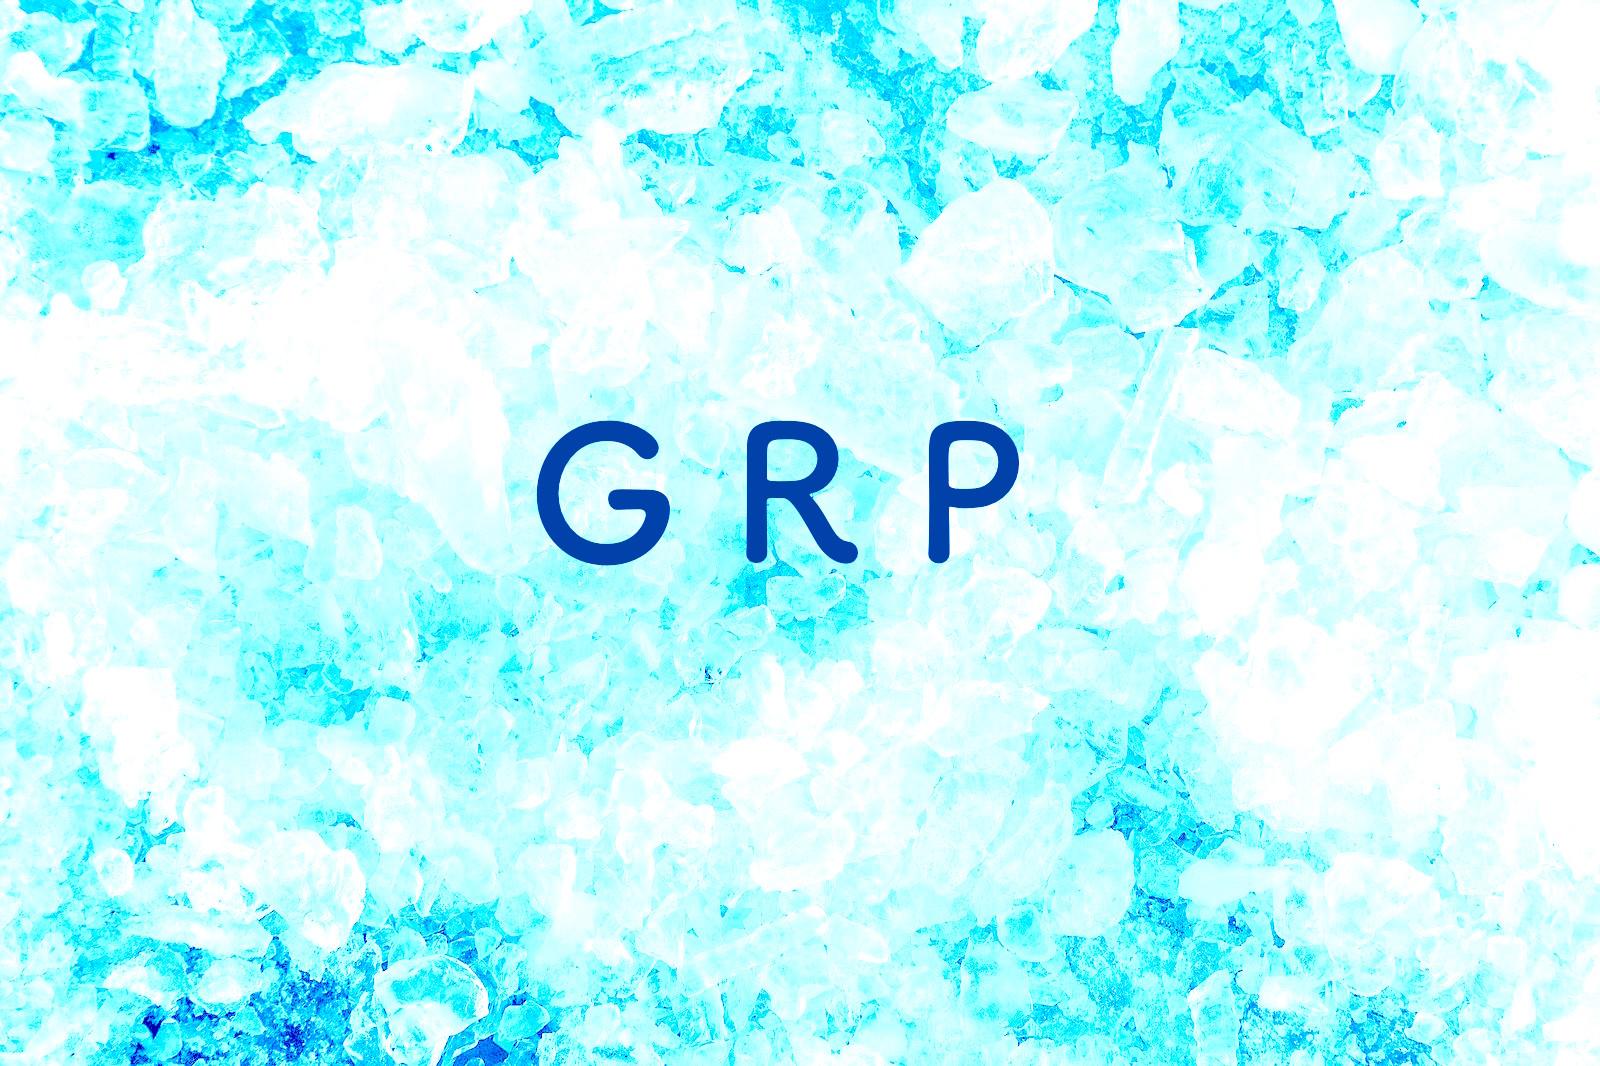 GRP(延べ視聴率)とCMの関係